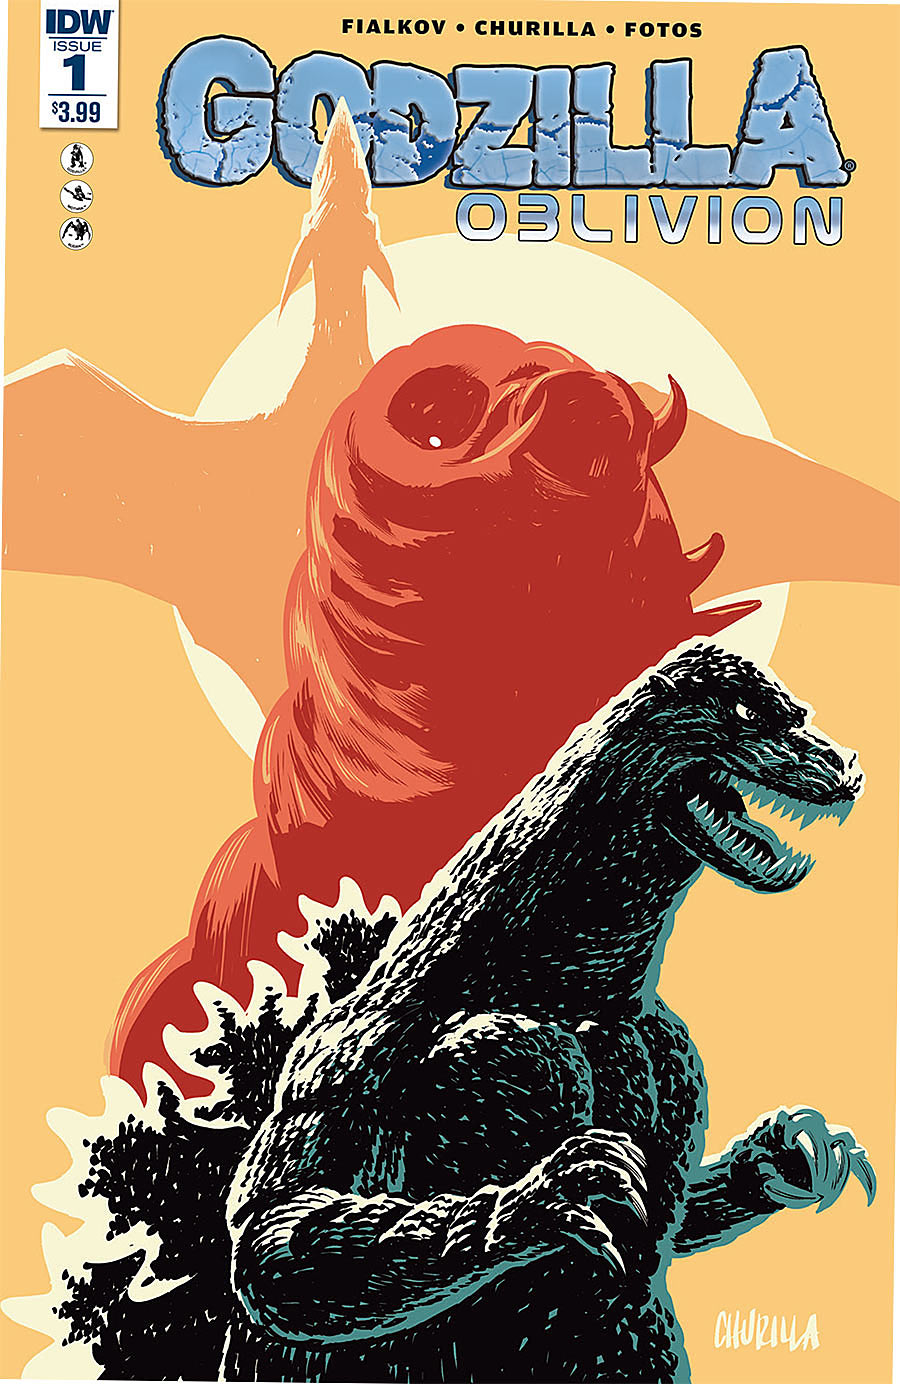 Godzilla-Oblivion #1 - Joshua Fialkov (W), Brian Churilla (A) • IDW Publishing